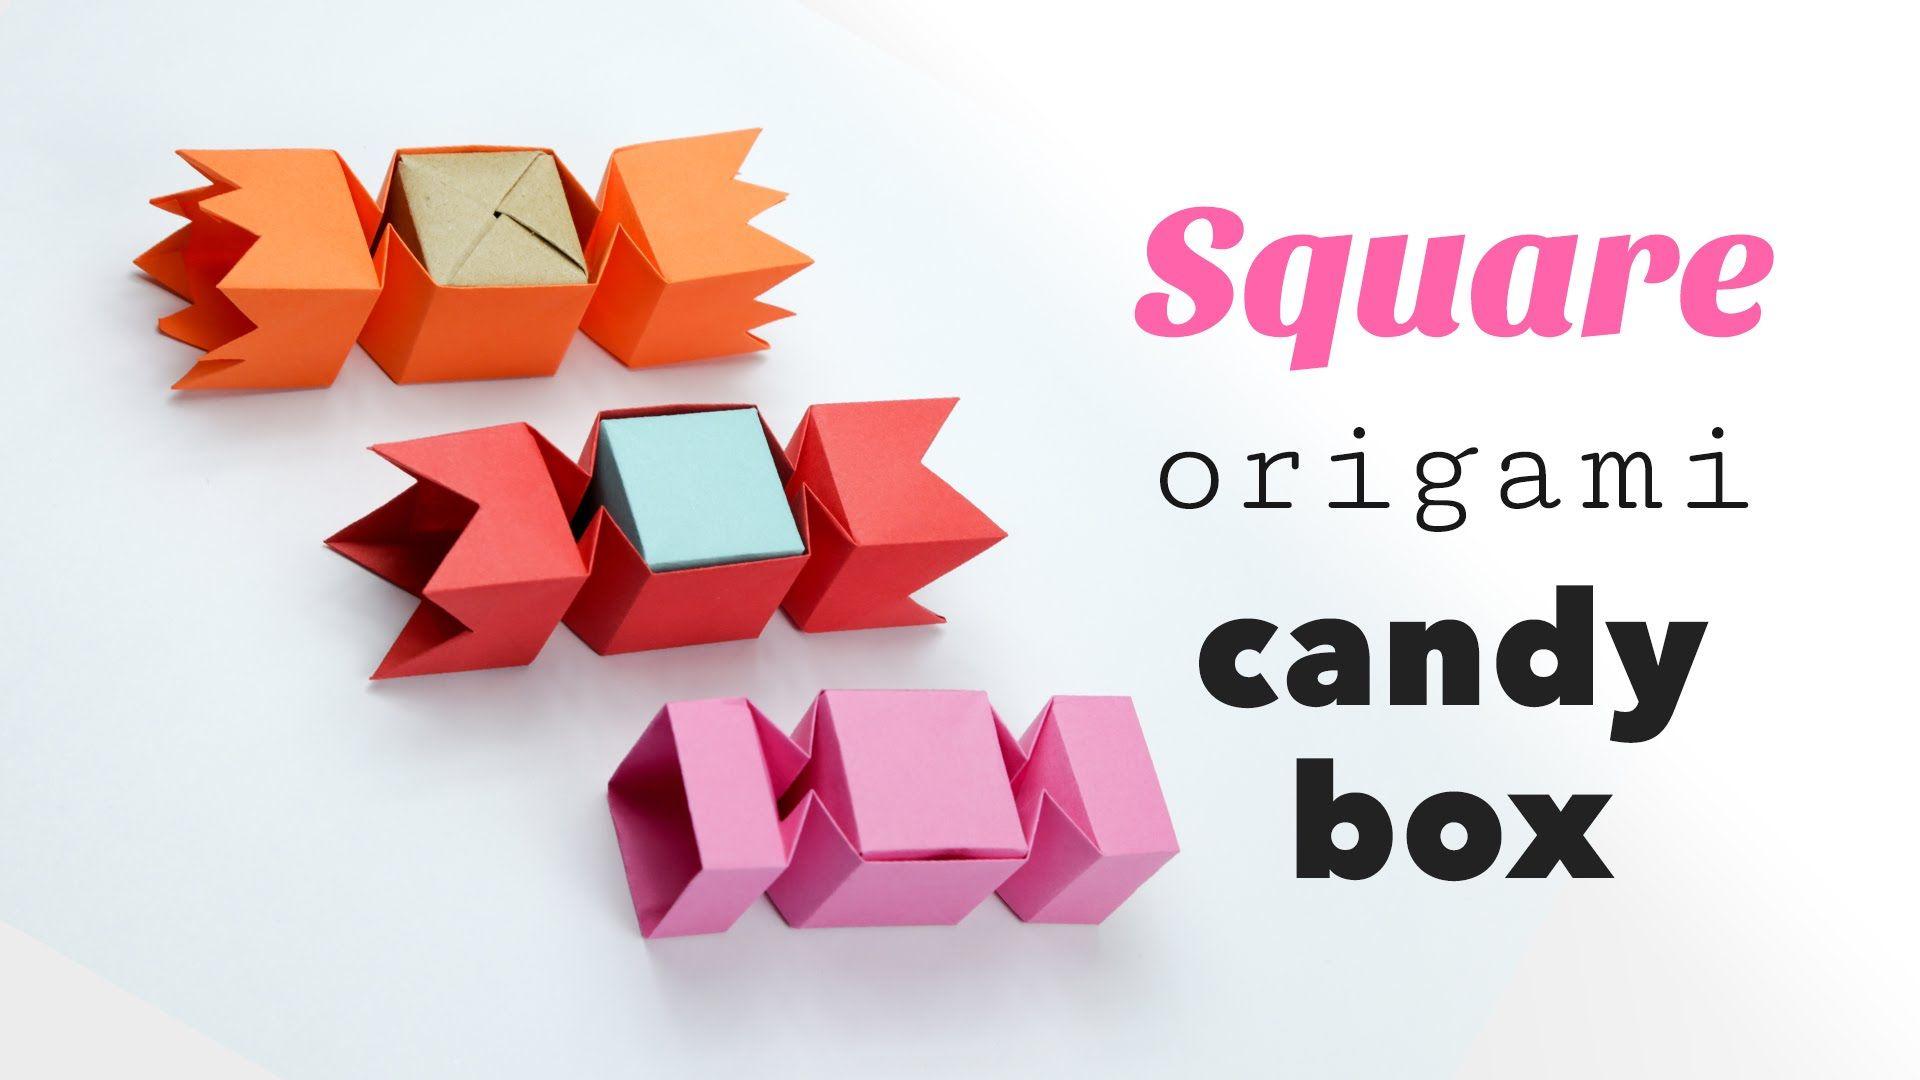 Square Origami Candy Box Tutorial Diy Origami Candy Origami Instructions Origami Candy Box